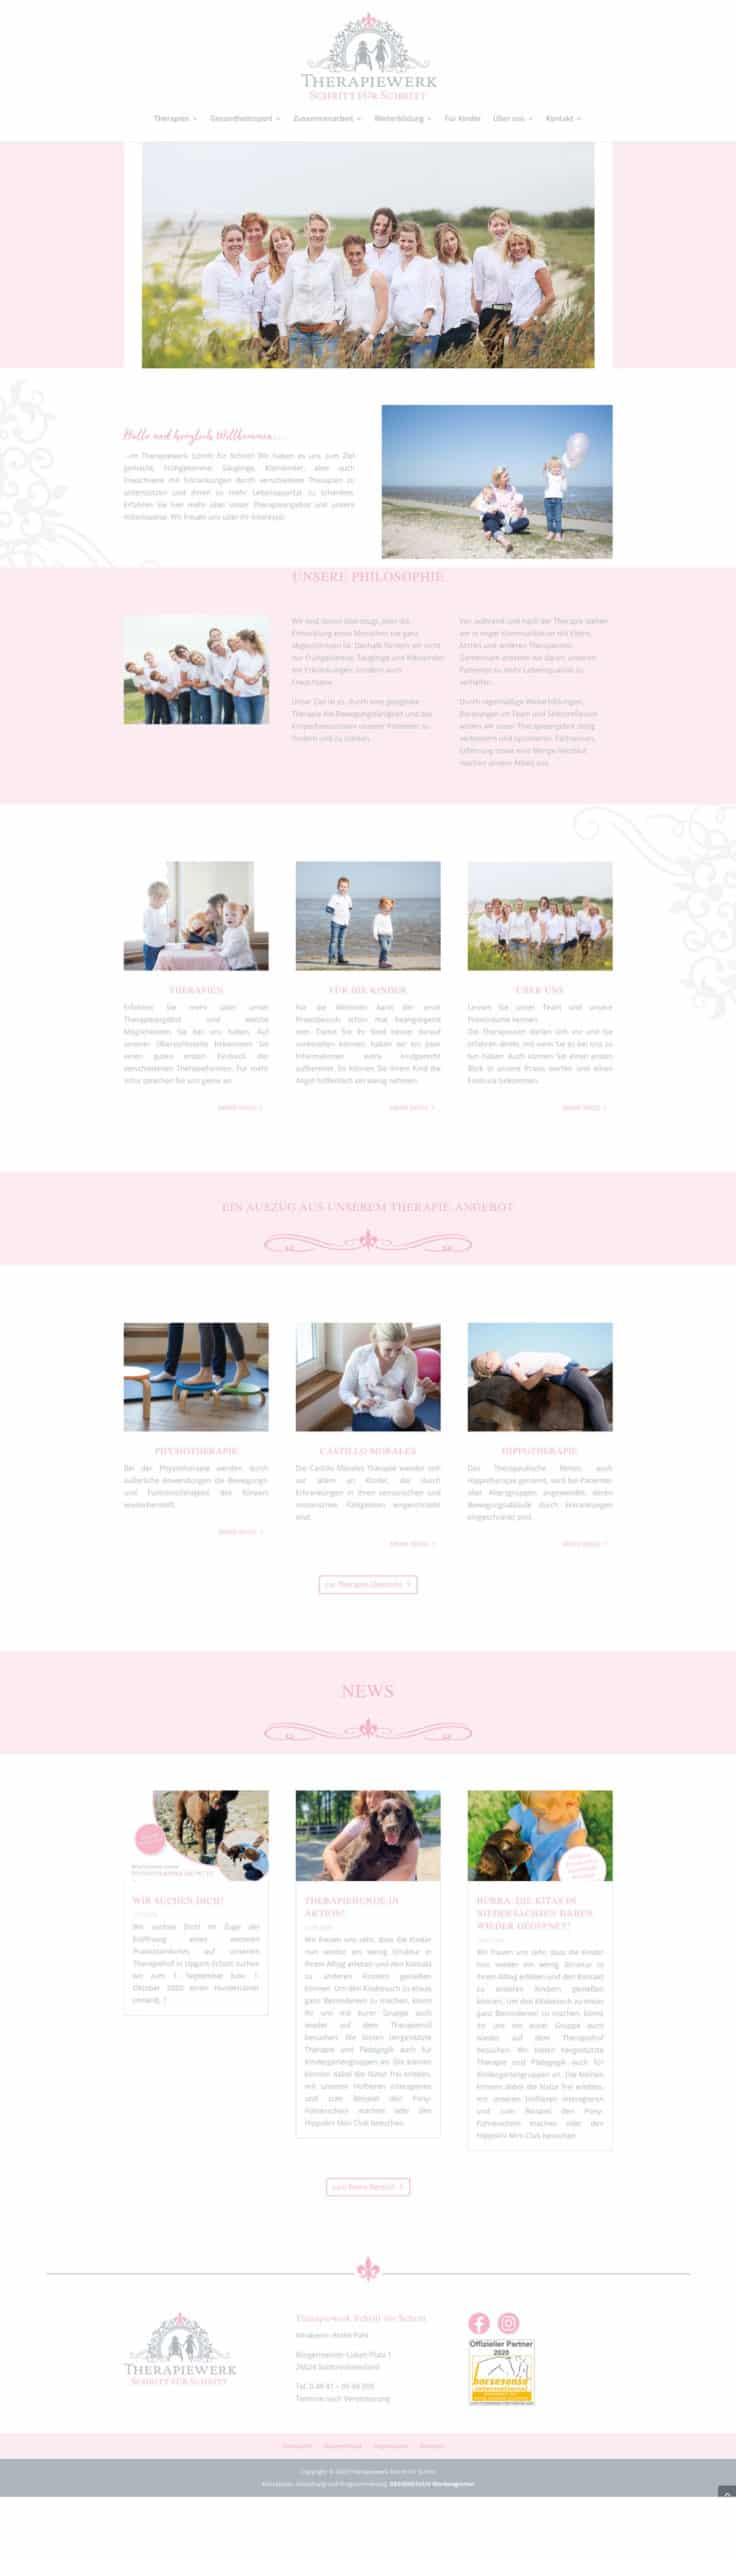 Designstuuv Referenzen Therapiewerk Website desktop